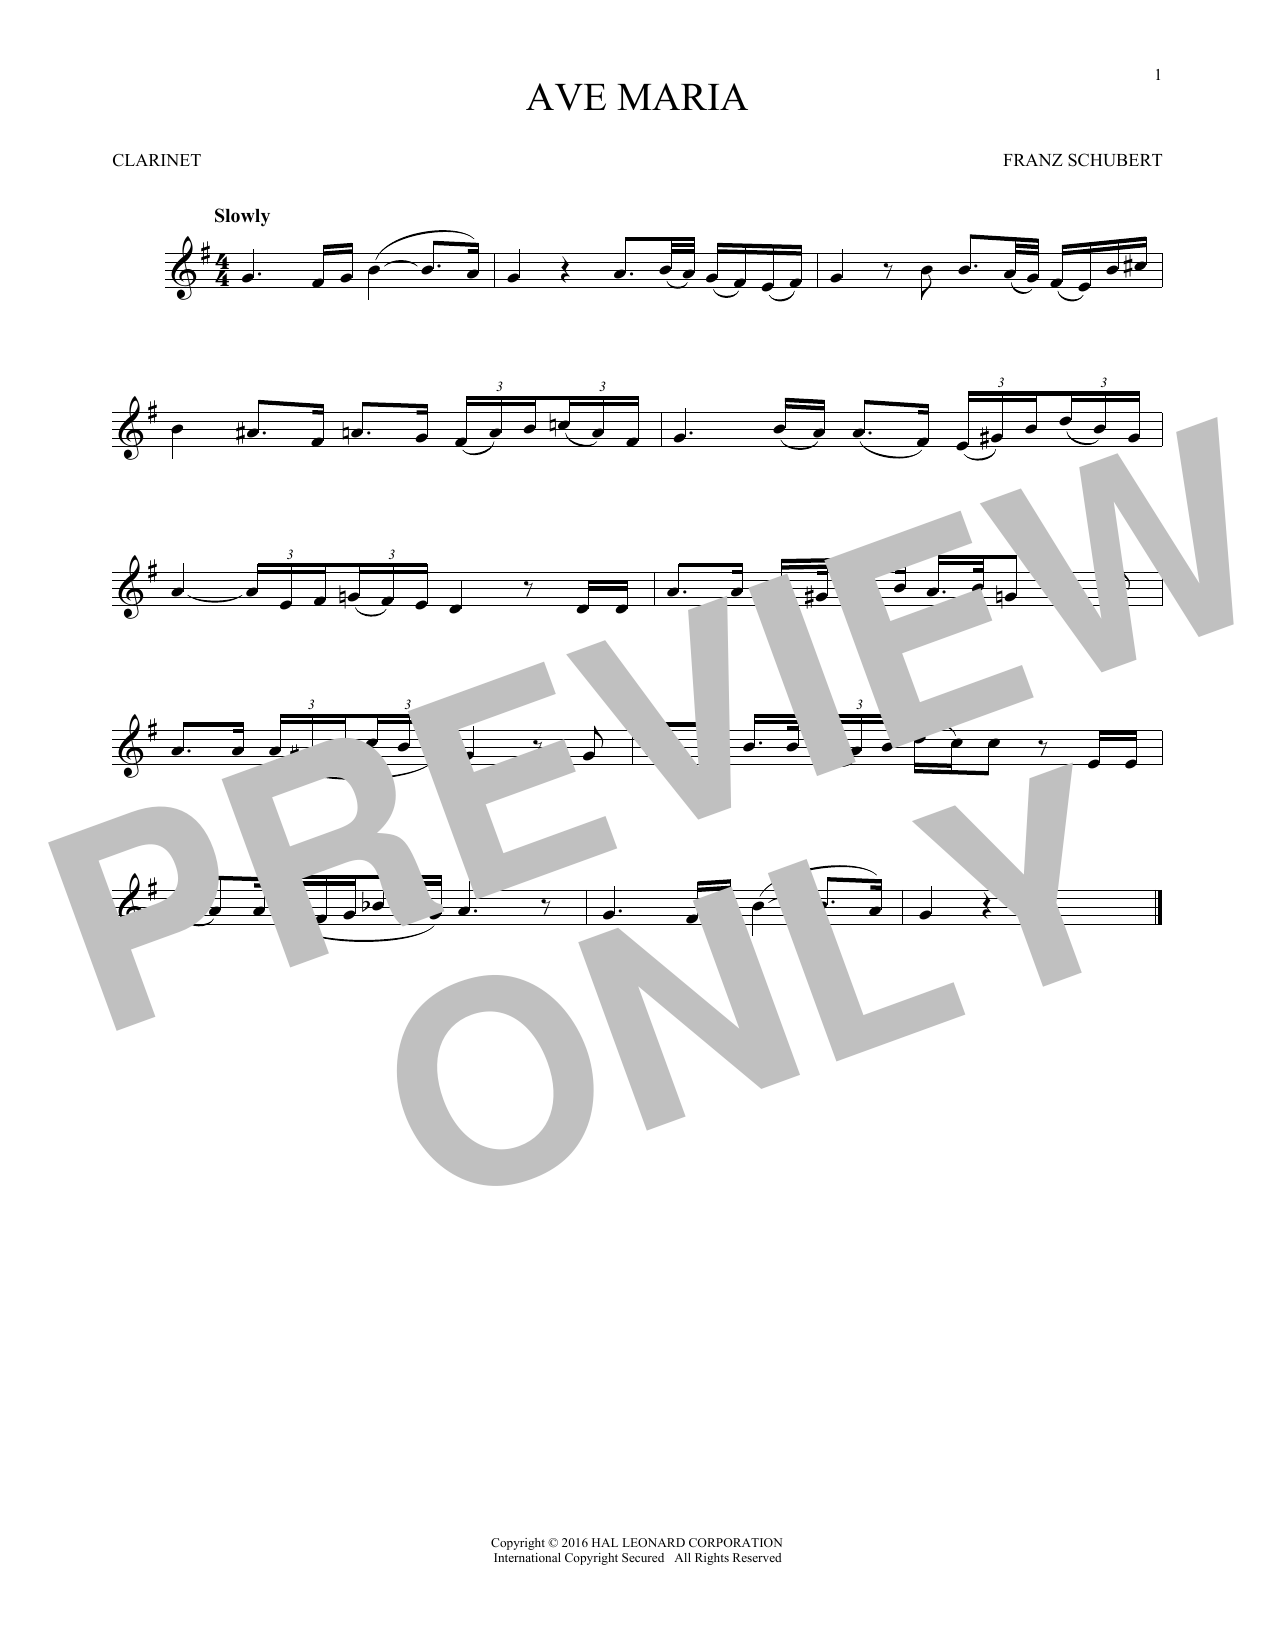 Ave Maria, Op. 52, No. 6 (Clarinet Solo)